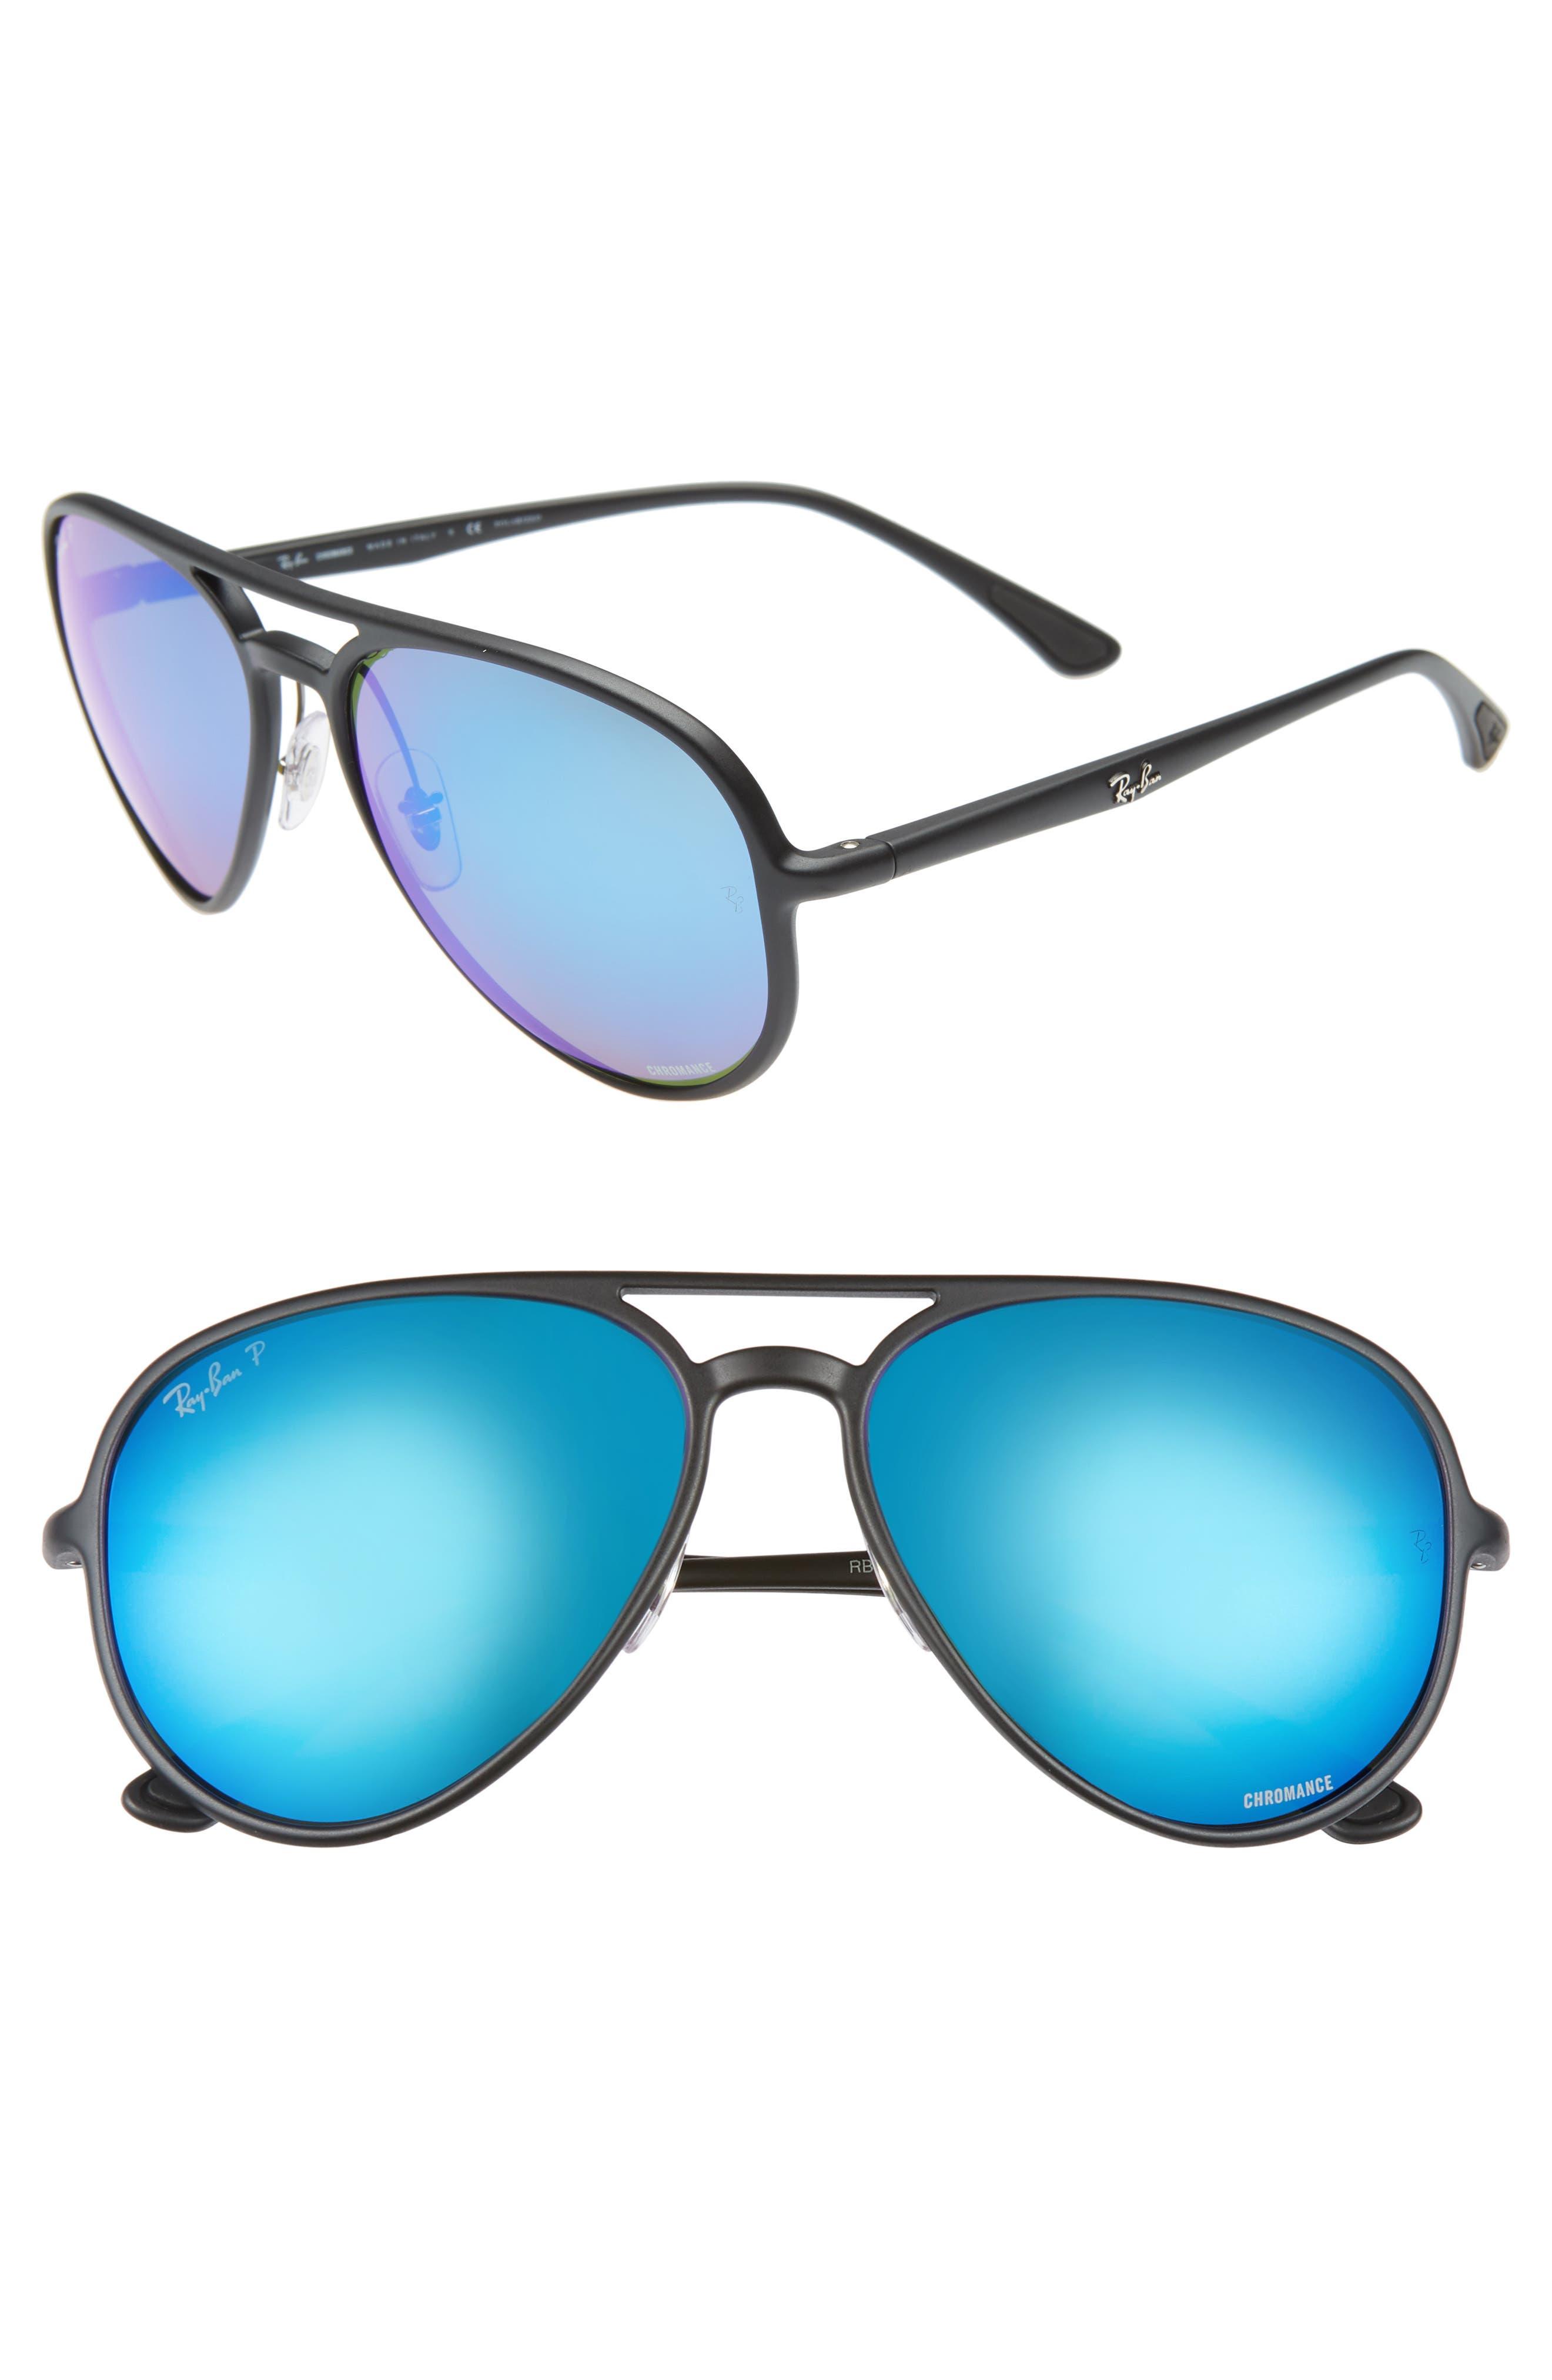 Ray-Ban 5m Polarized Aviator Sunglasses - Matte Black